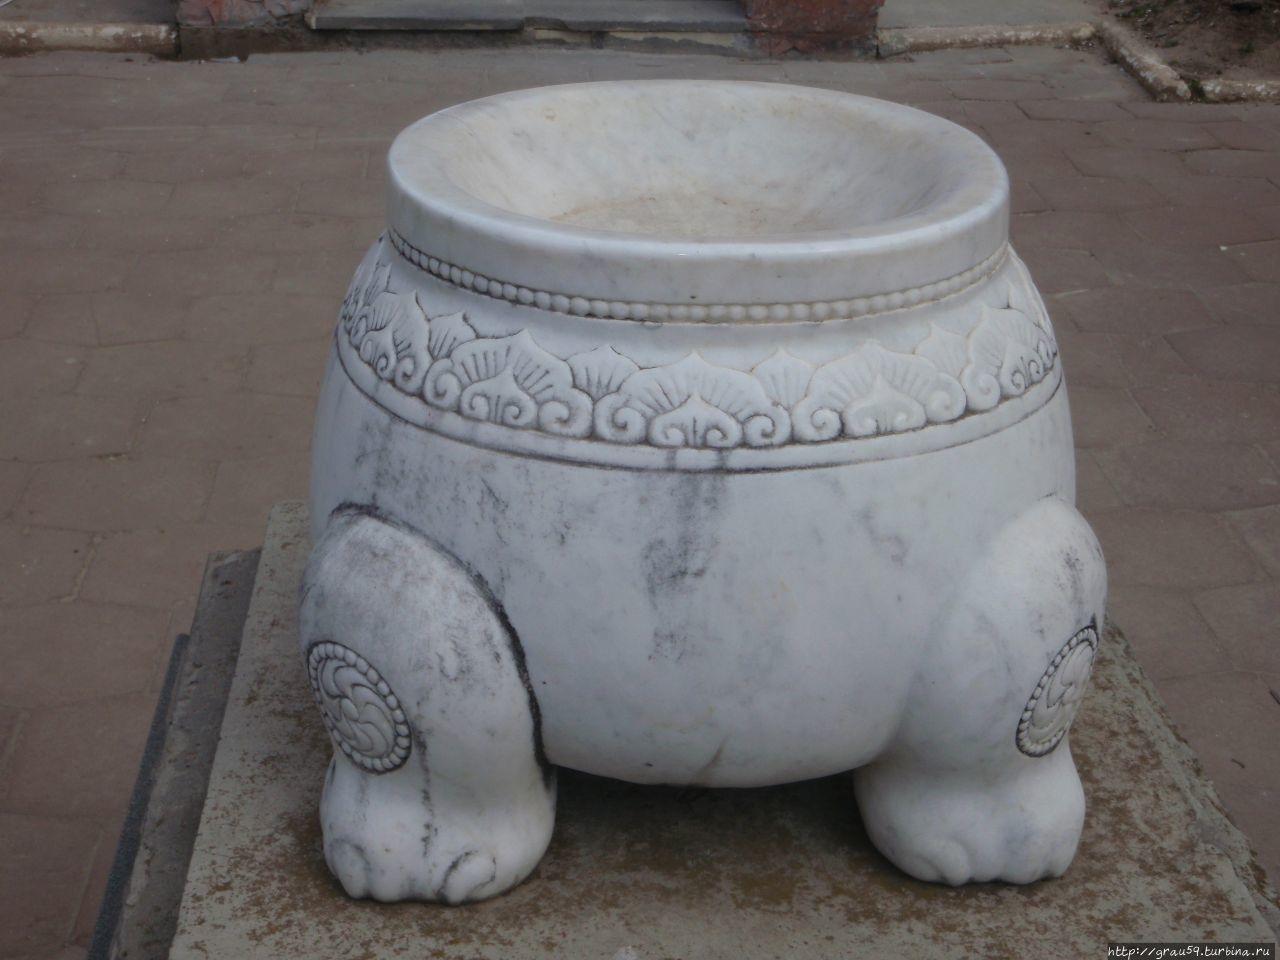 Статуя Будды Шакьямуни Элиста, Россия